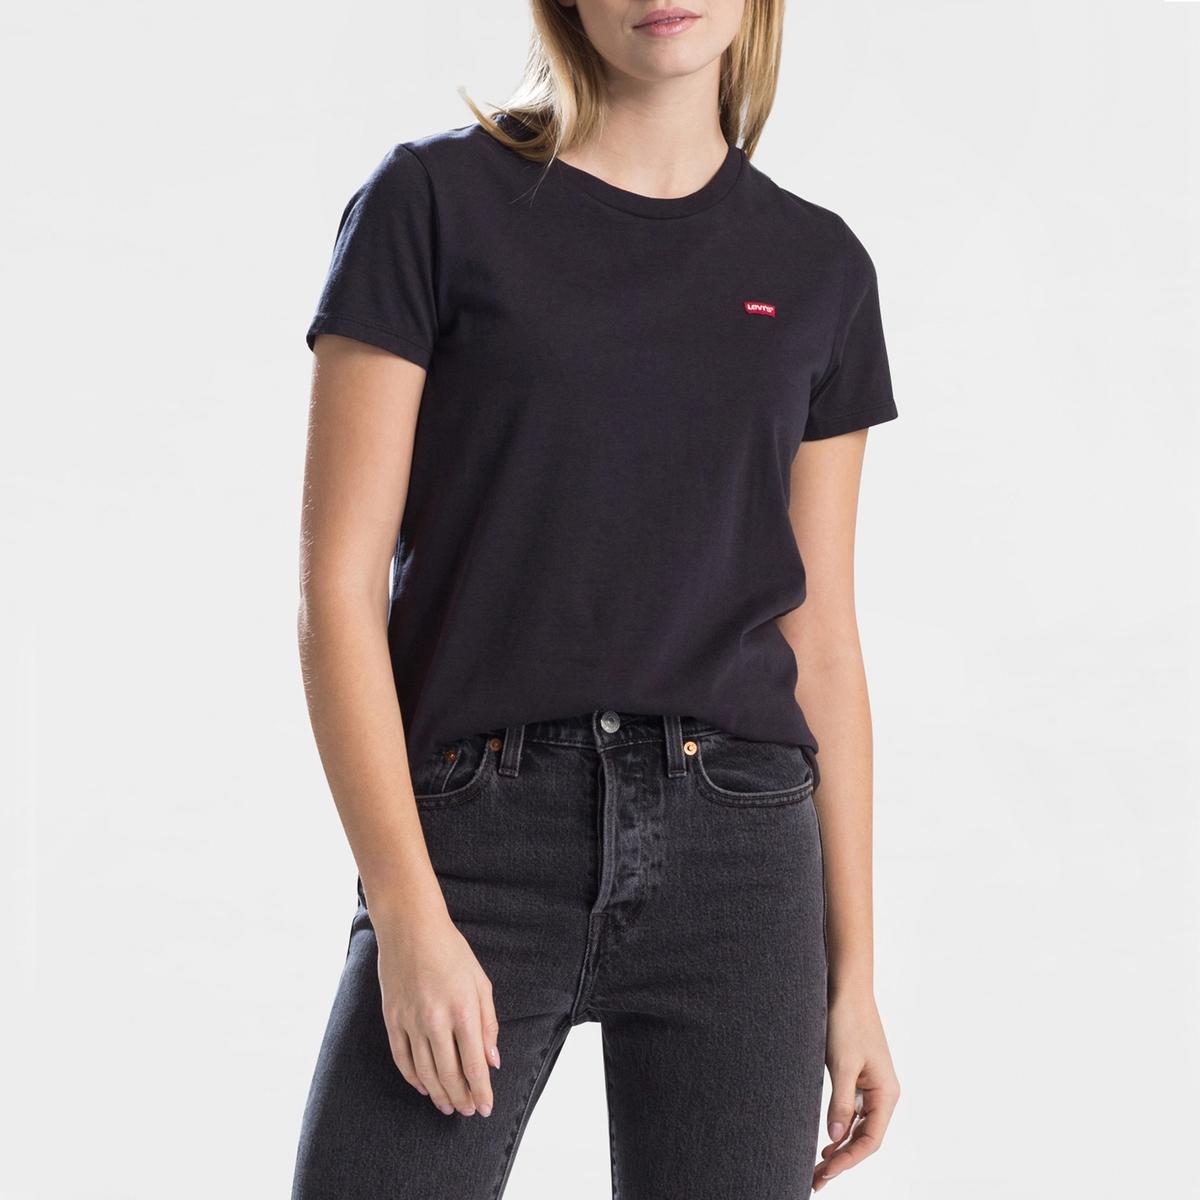 Camiseta PERFECT TEE, con cuello redondo y manga corta